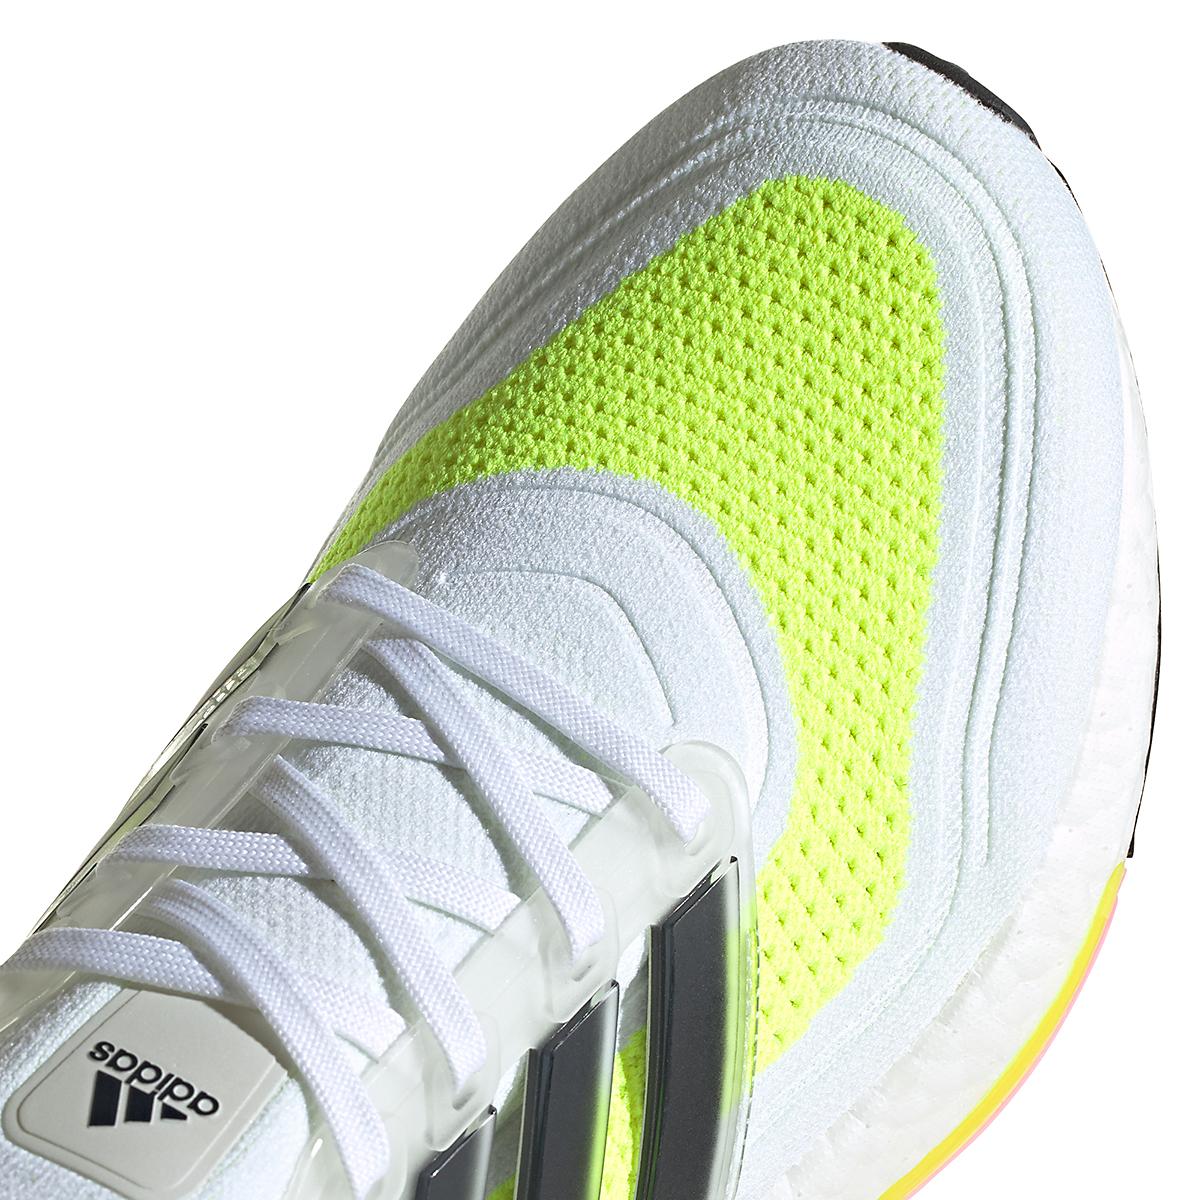 Men's Adidas Ultraboost 21 Running Shoe - Color: Cloud White/Black/Solar Yellow - Size: 5 - Width: Regular, Cloud White/Black/Solar Yellow, large, image 4